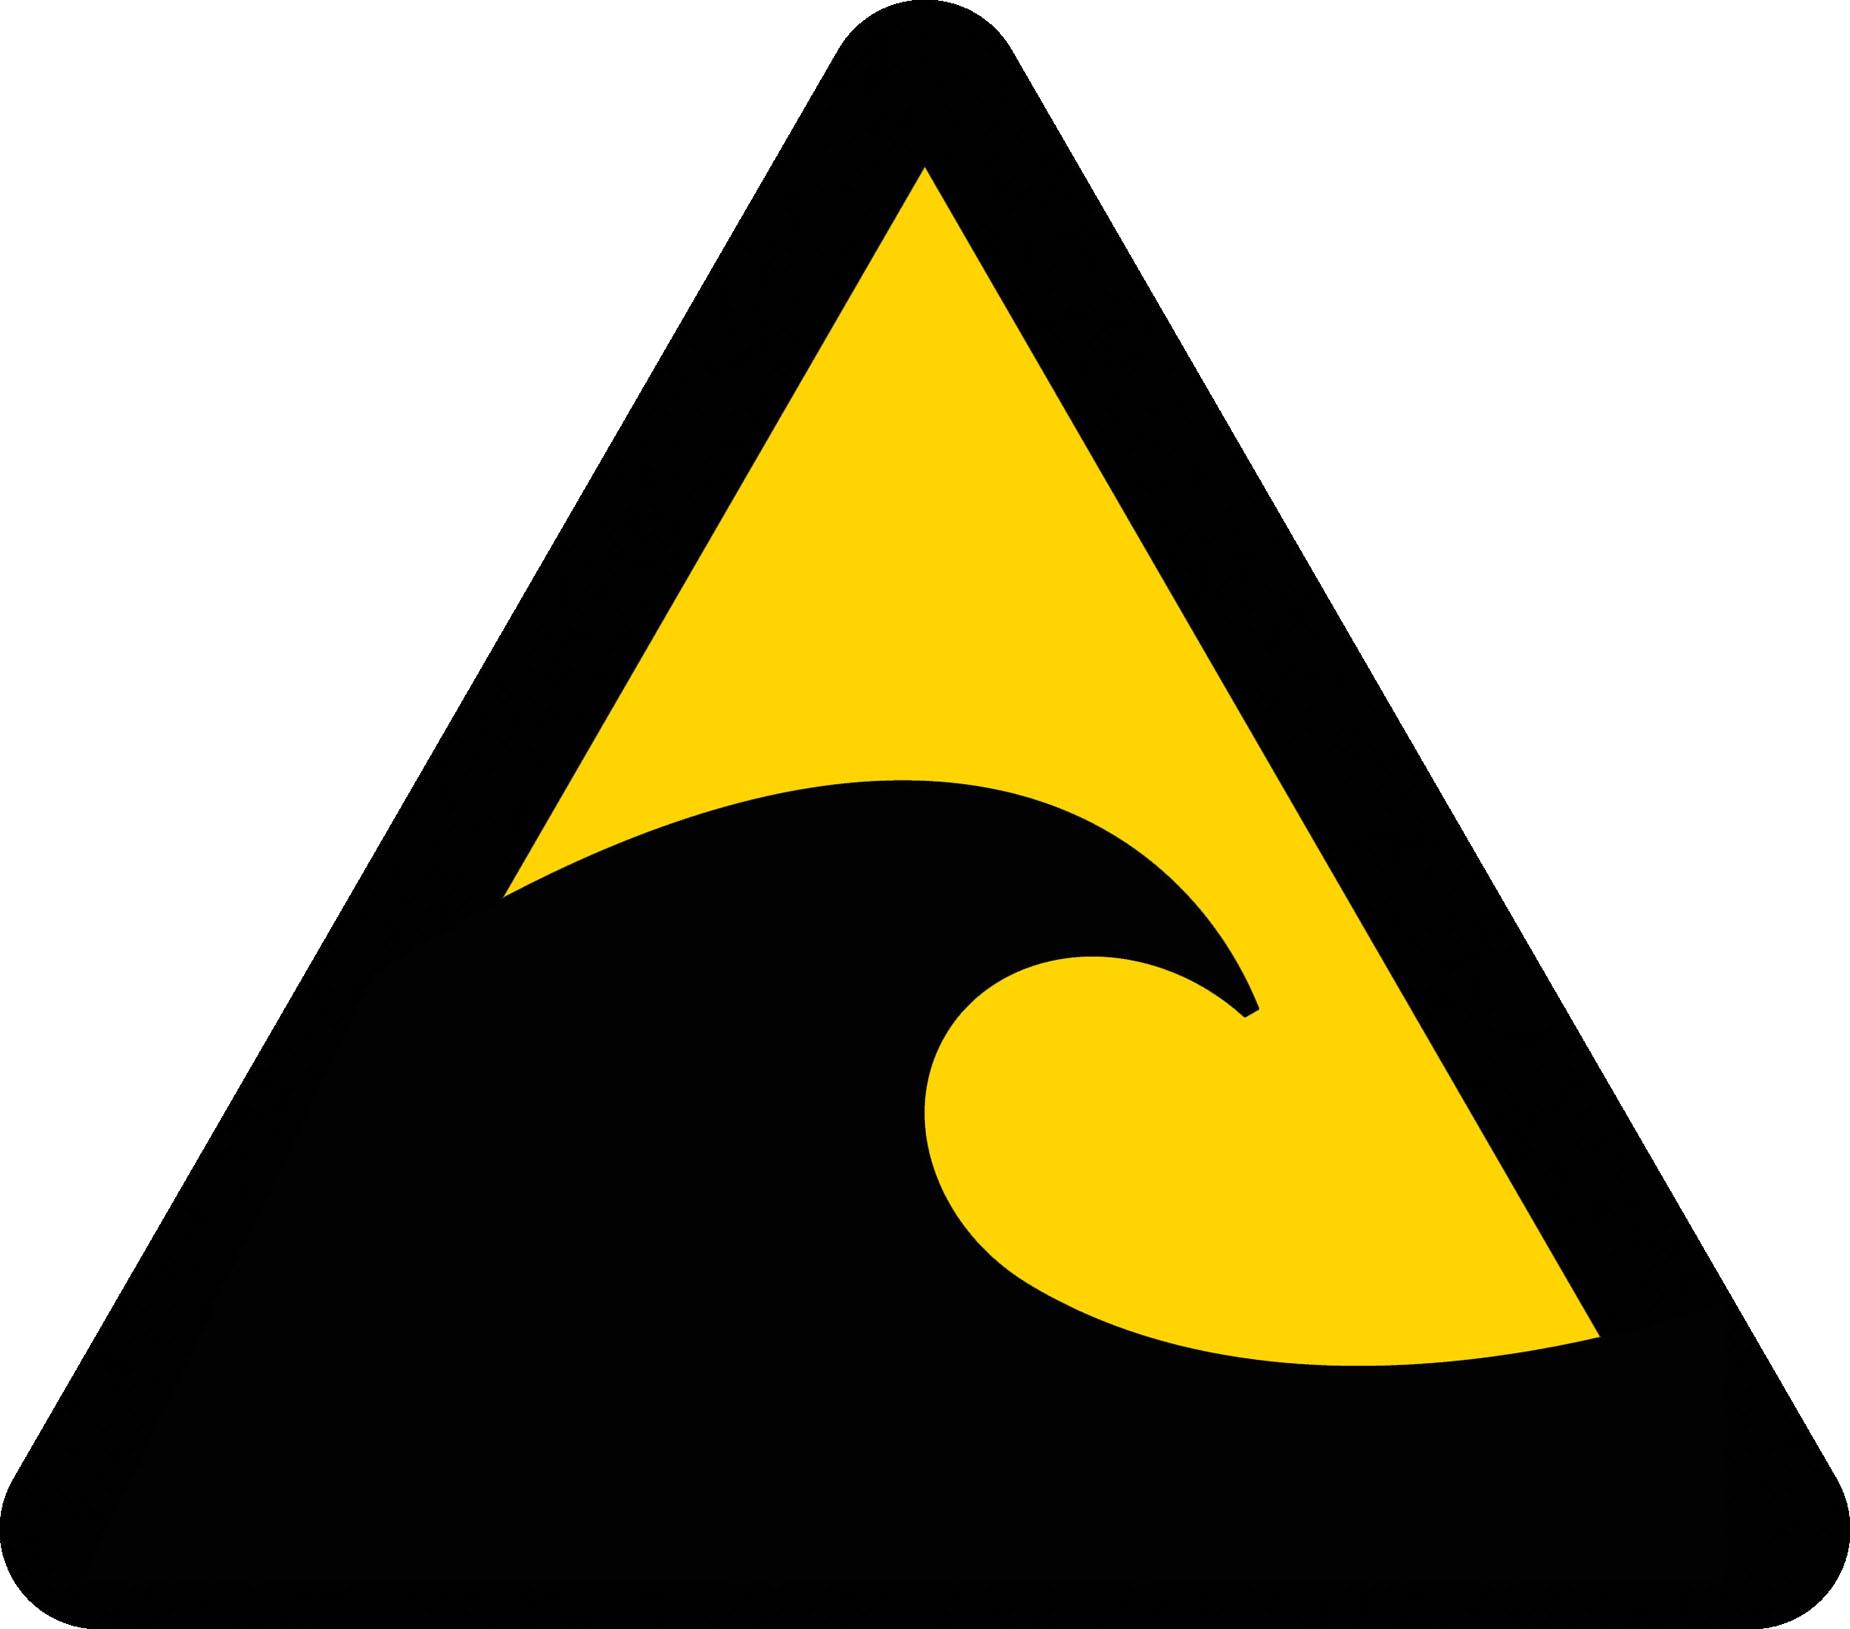 tsunami hazard sign clipart clipart panda free clipart warning clip art free images warning clip art free